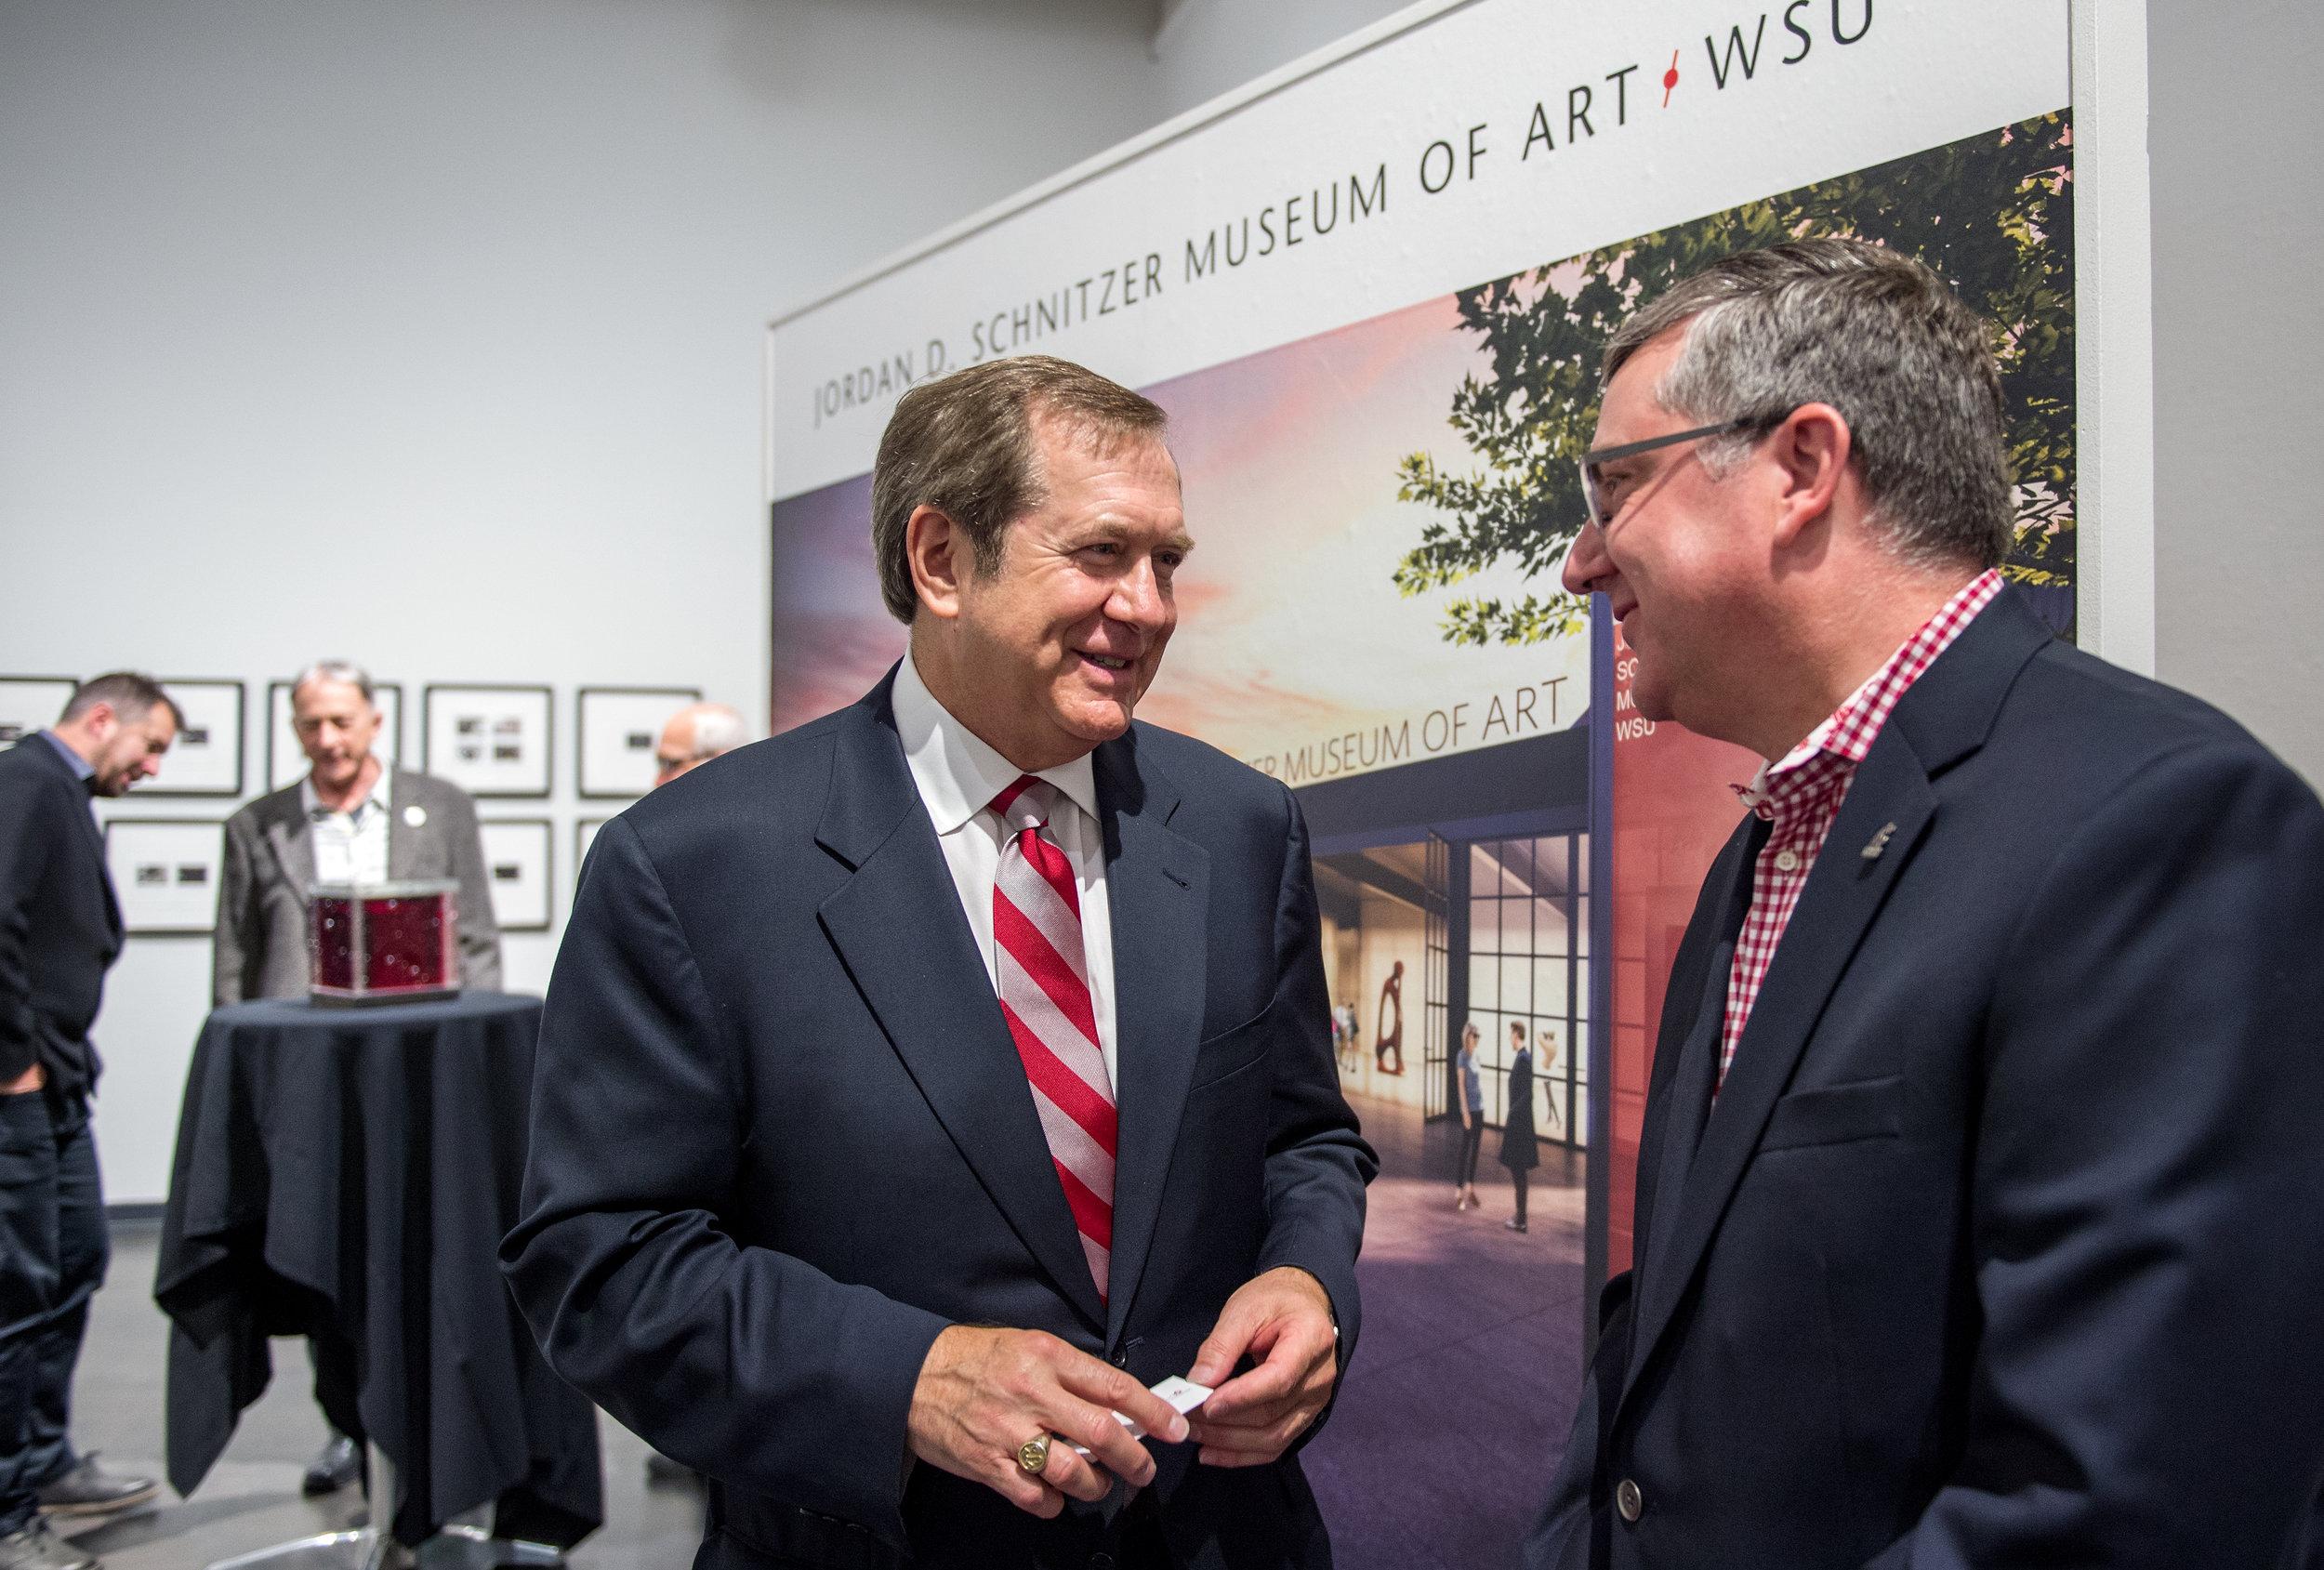 WSU-Museum-of-art_2016-09-30-2580.jpg